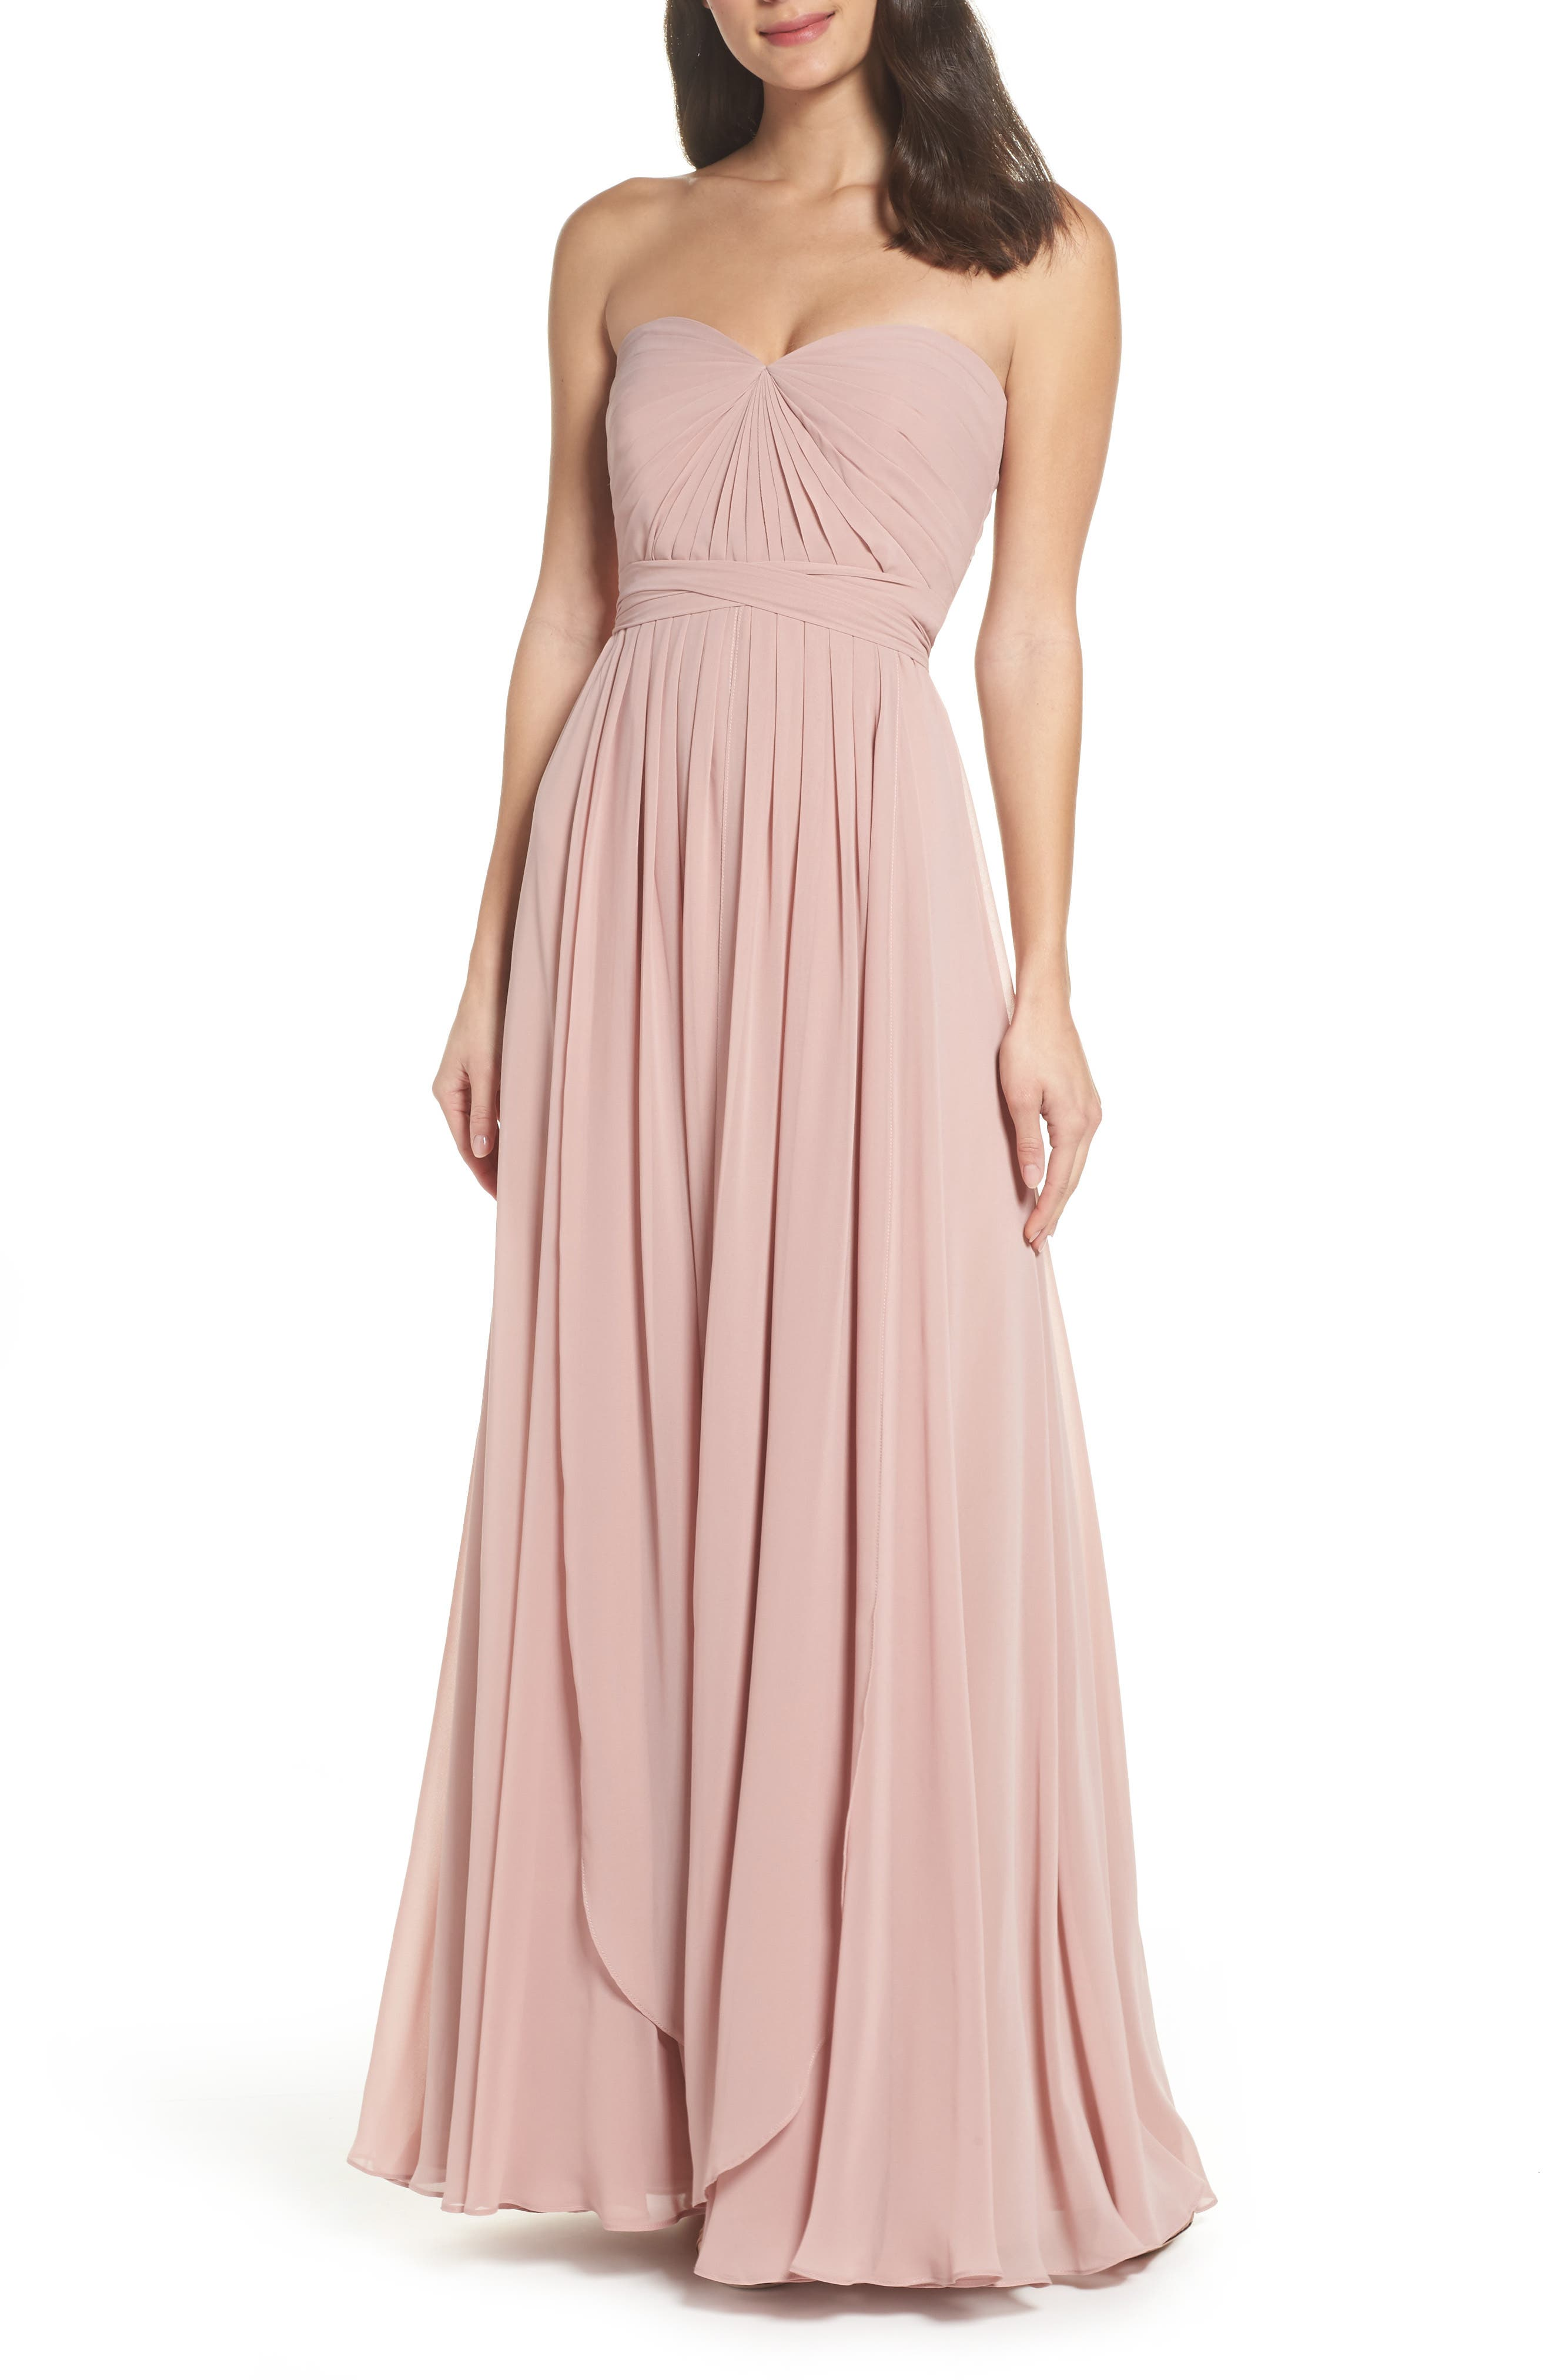 Strapless Bridesmaid Dresses | Nordstrom